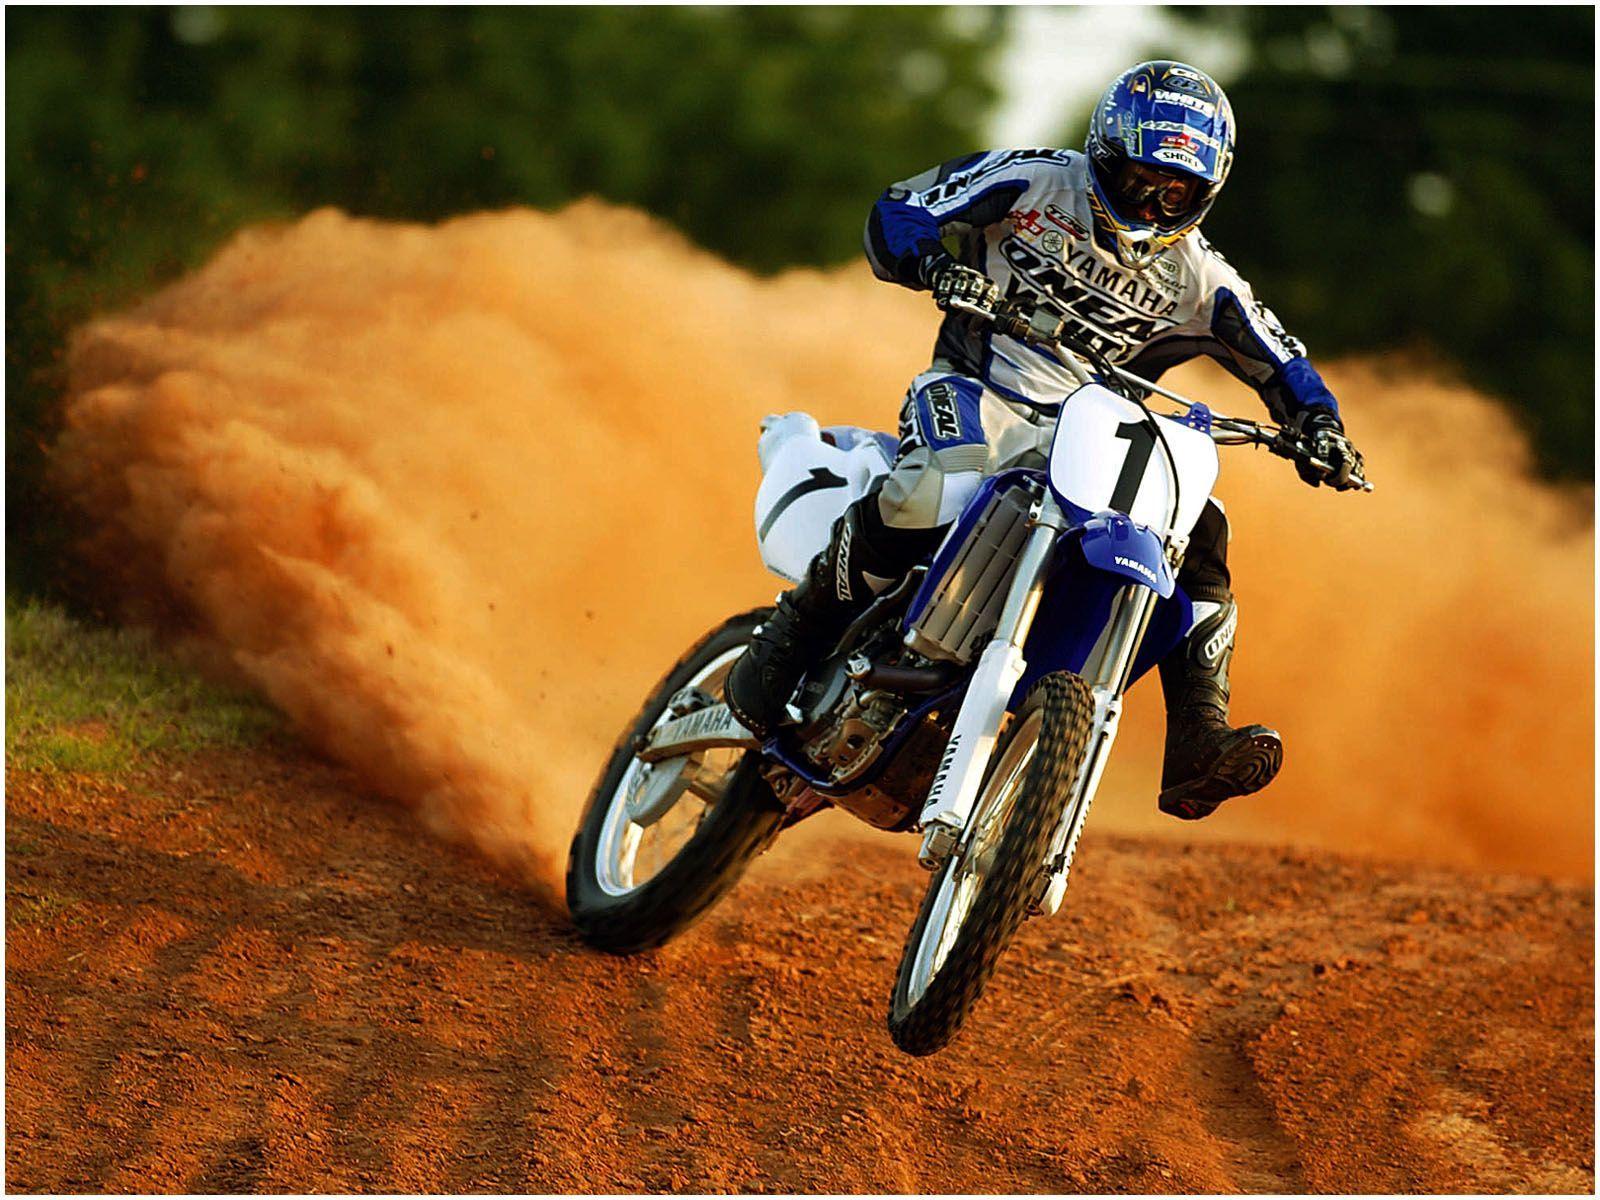 motocross yamaha dirt bike wallpaper hd 12 motorcycle high